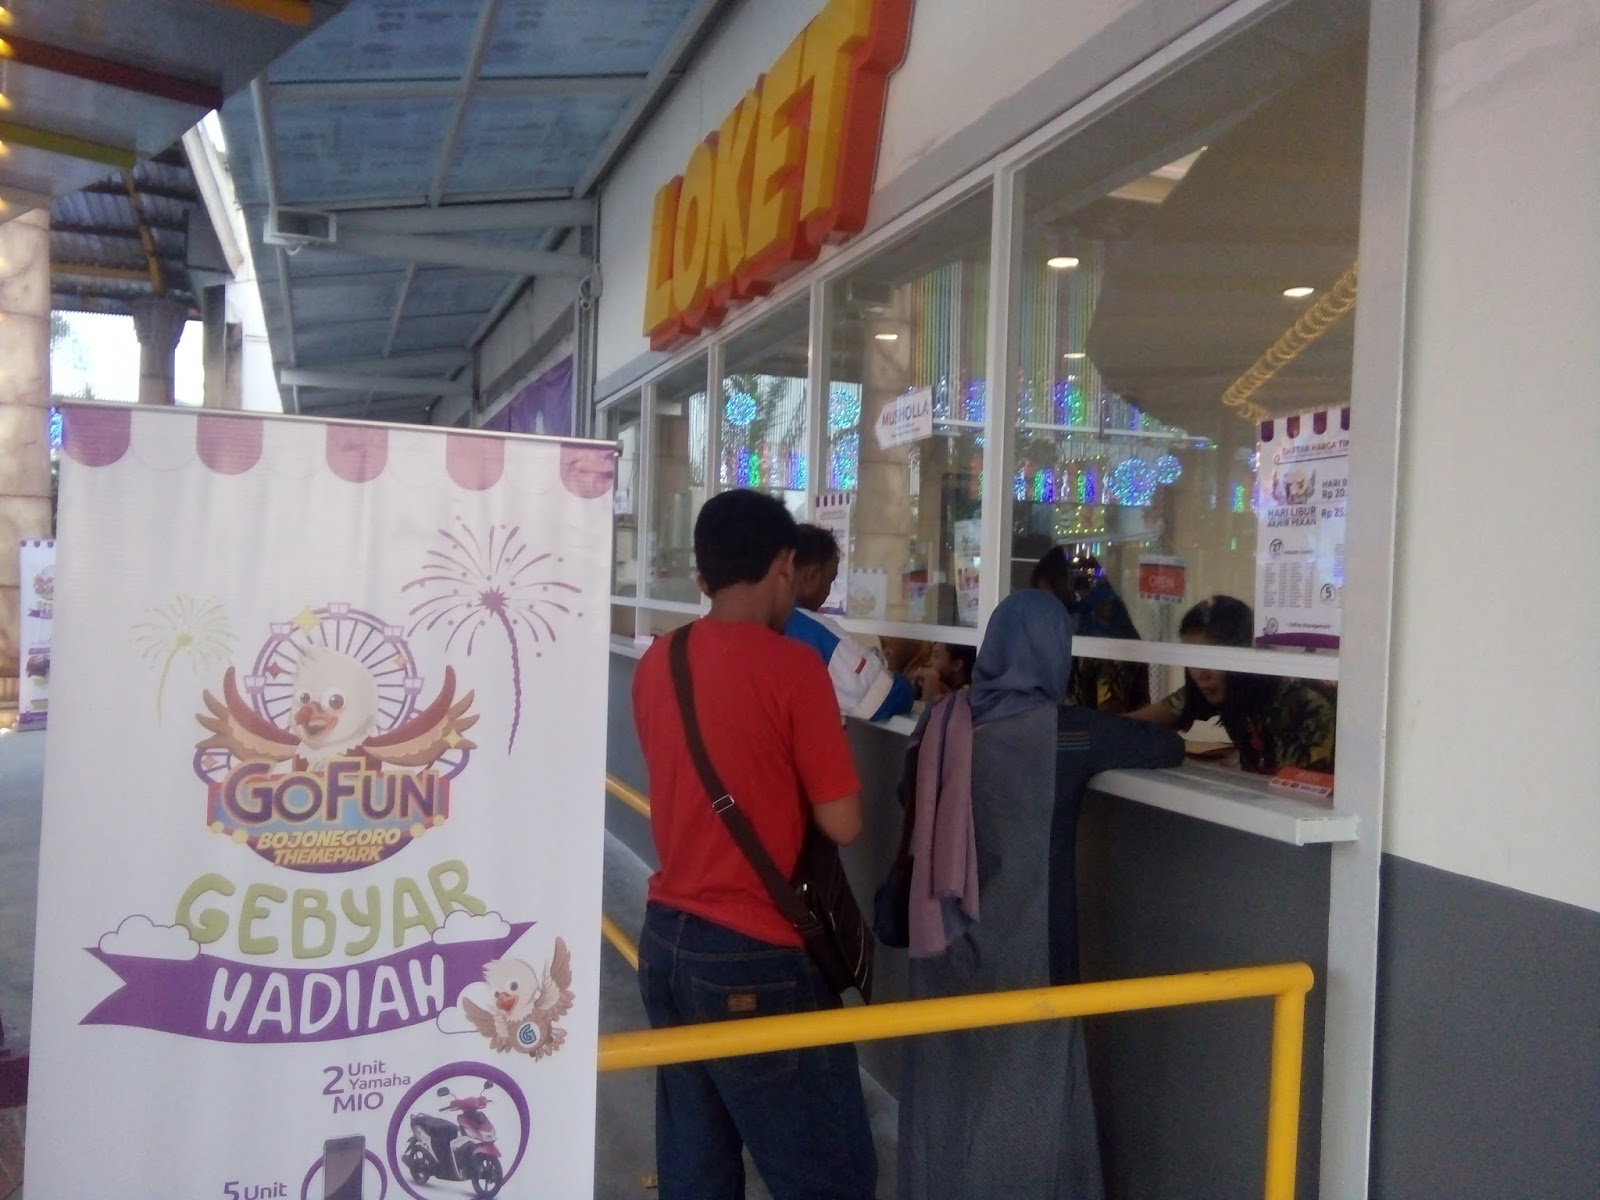 Jalan Gofun Bojonegoro Theme Park Destinasi Wisata Wahana Oya Tiket